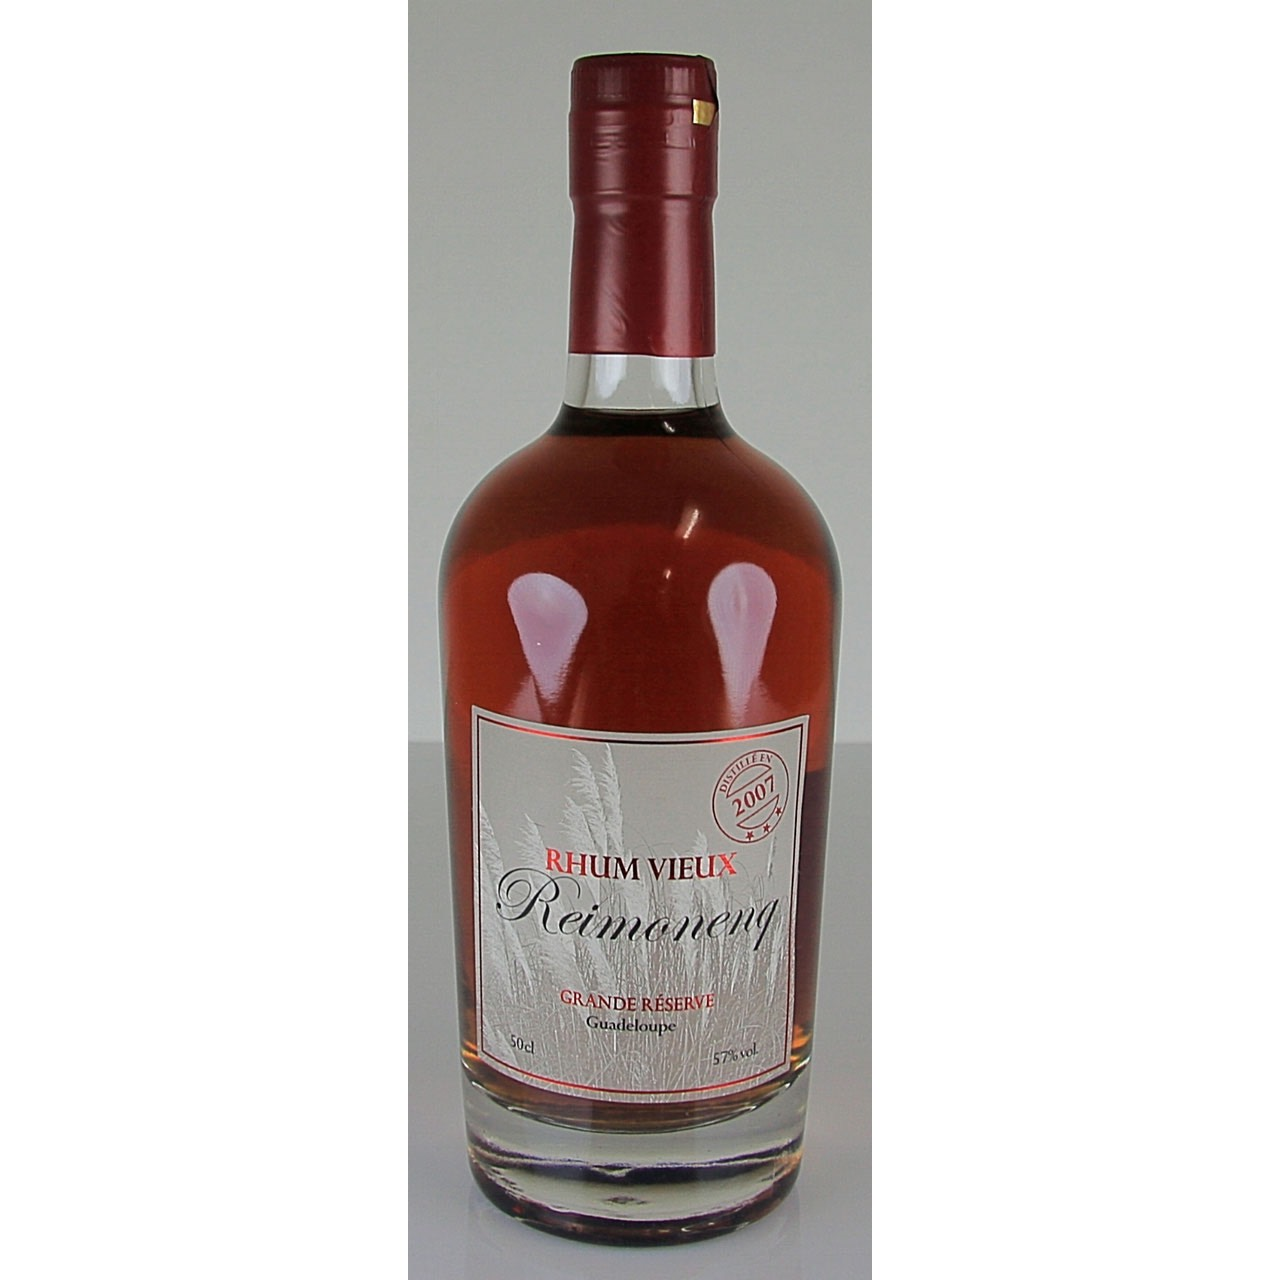 Bottle image of Grande Réserve